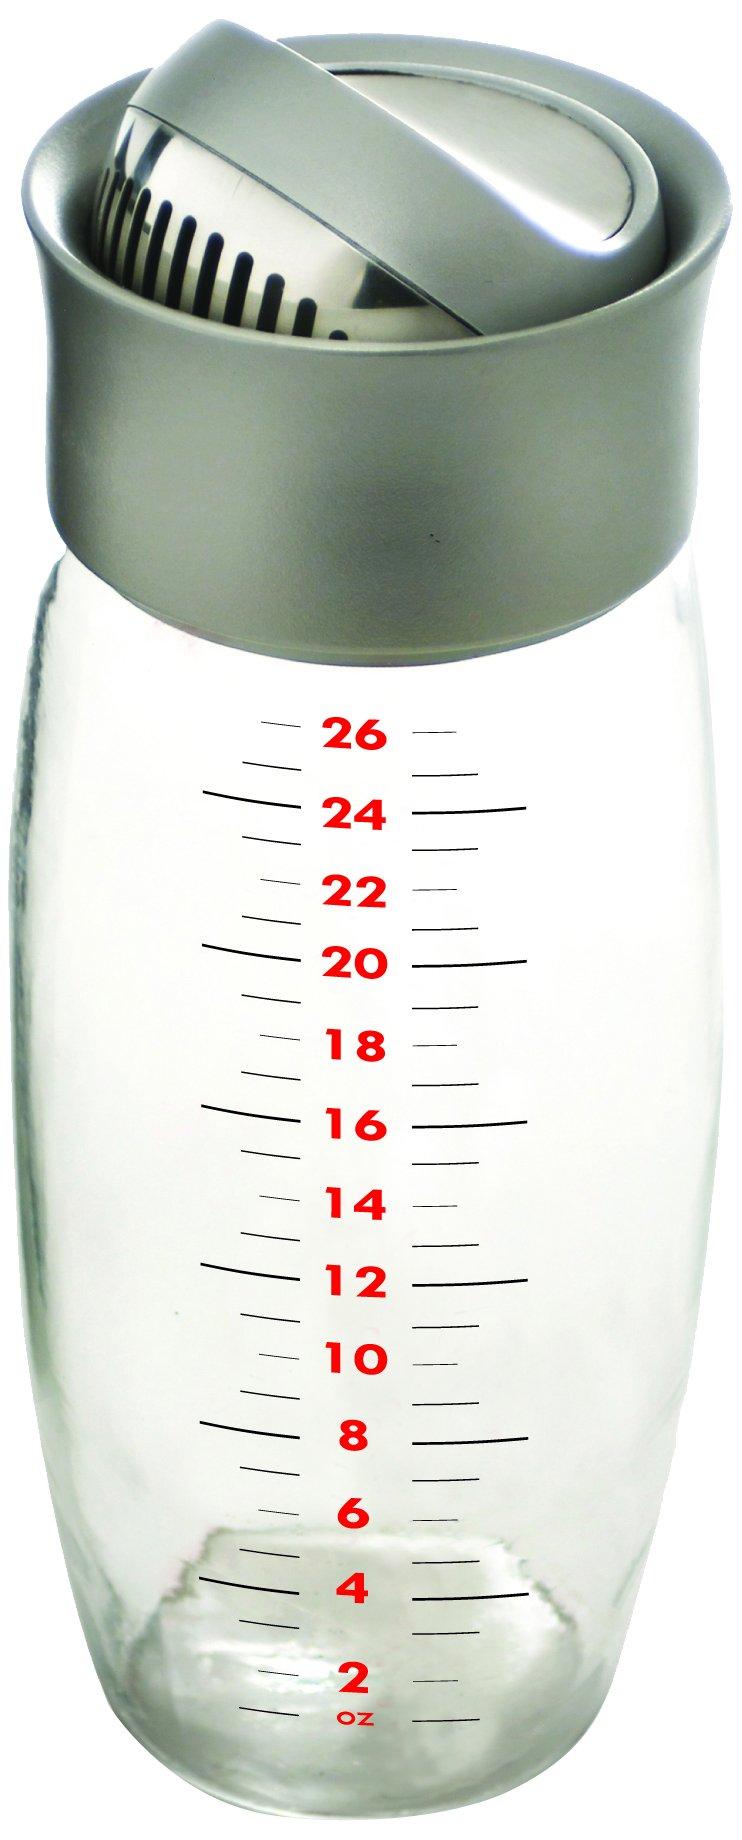 Metrokane Boston Flip-Top Cocktail Shaker, 26 Ounce by Metrokane